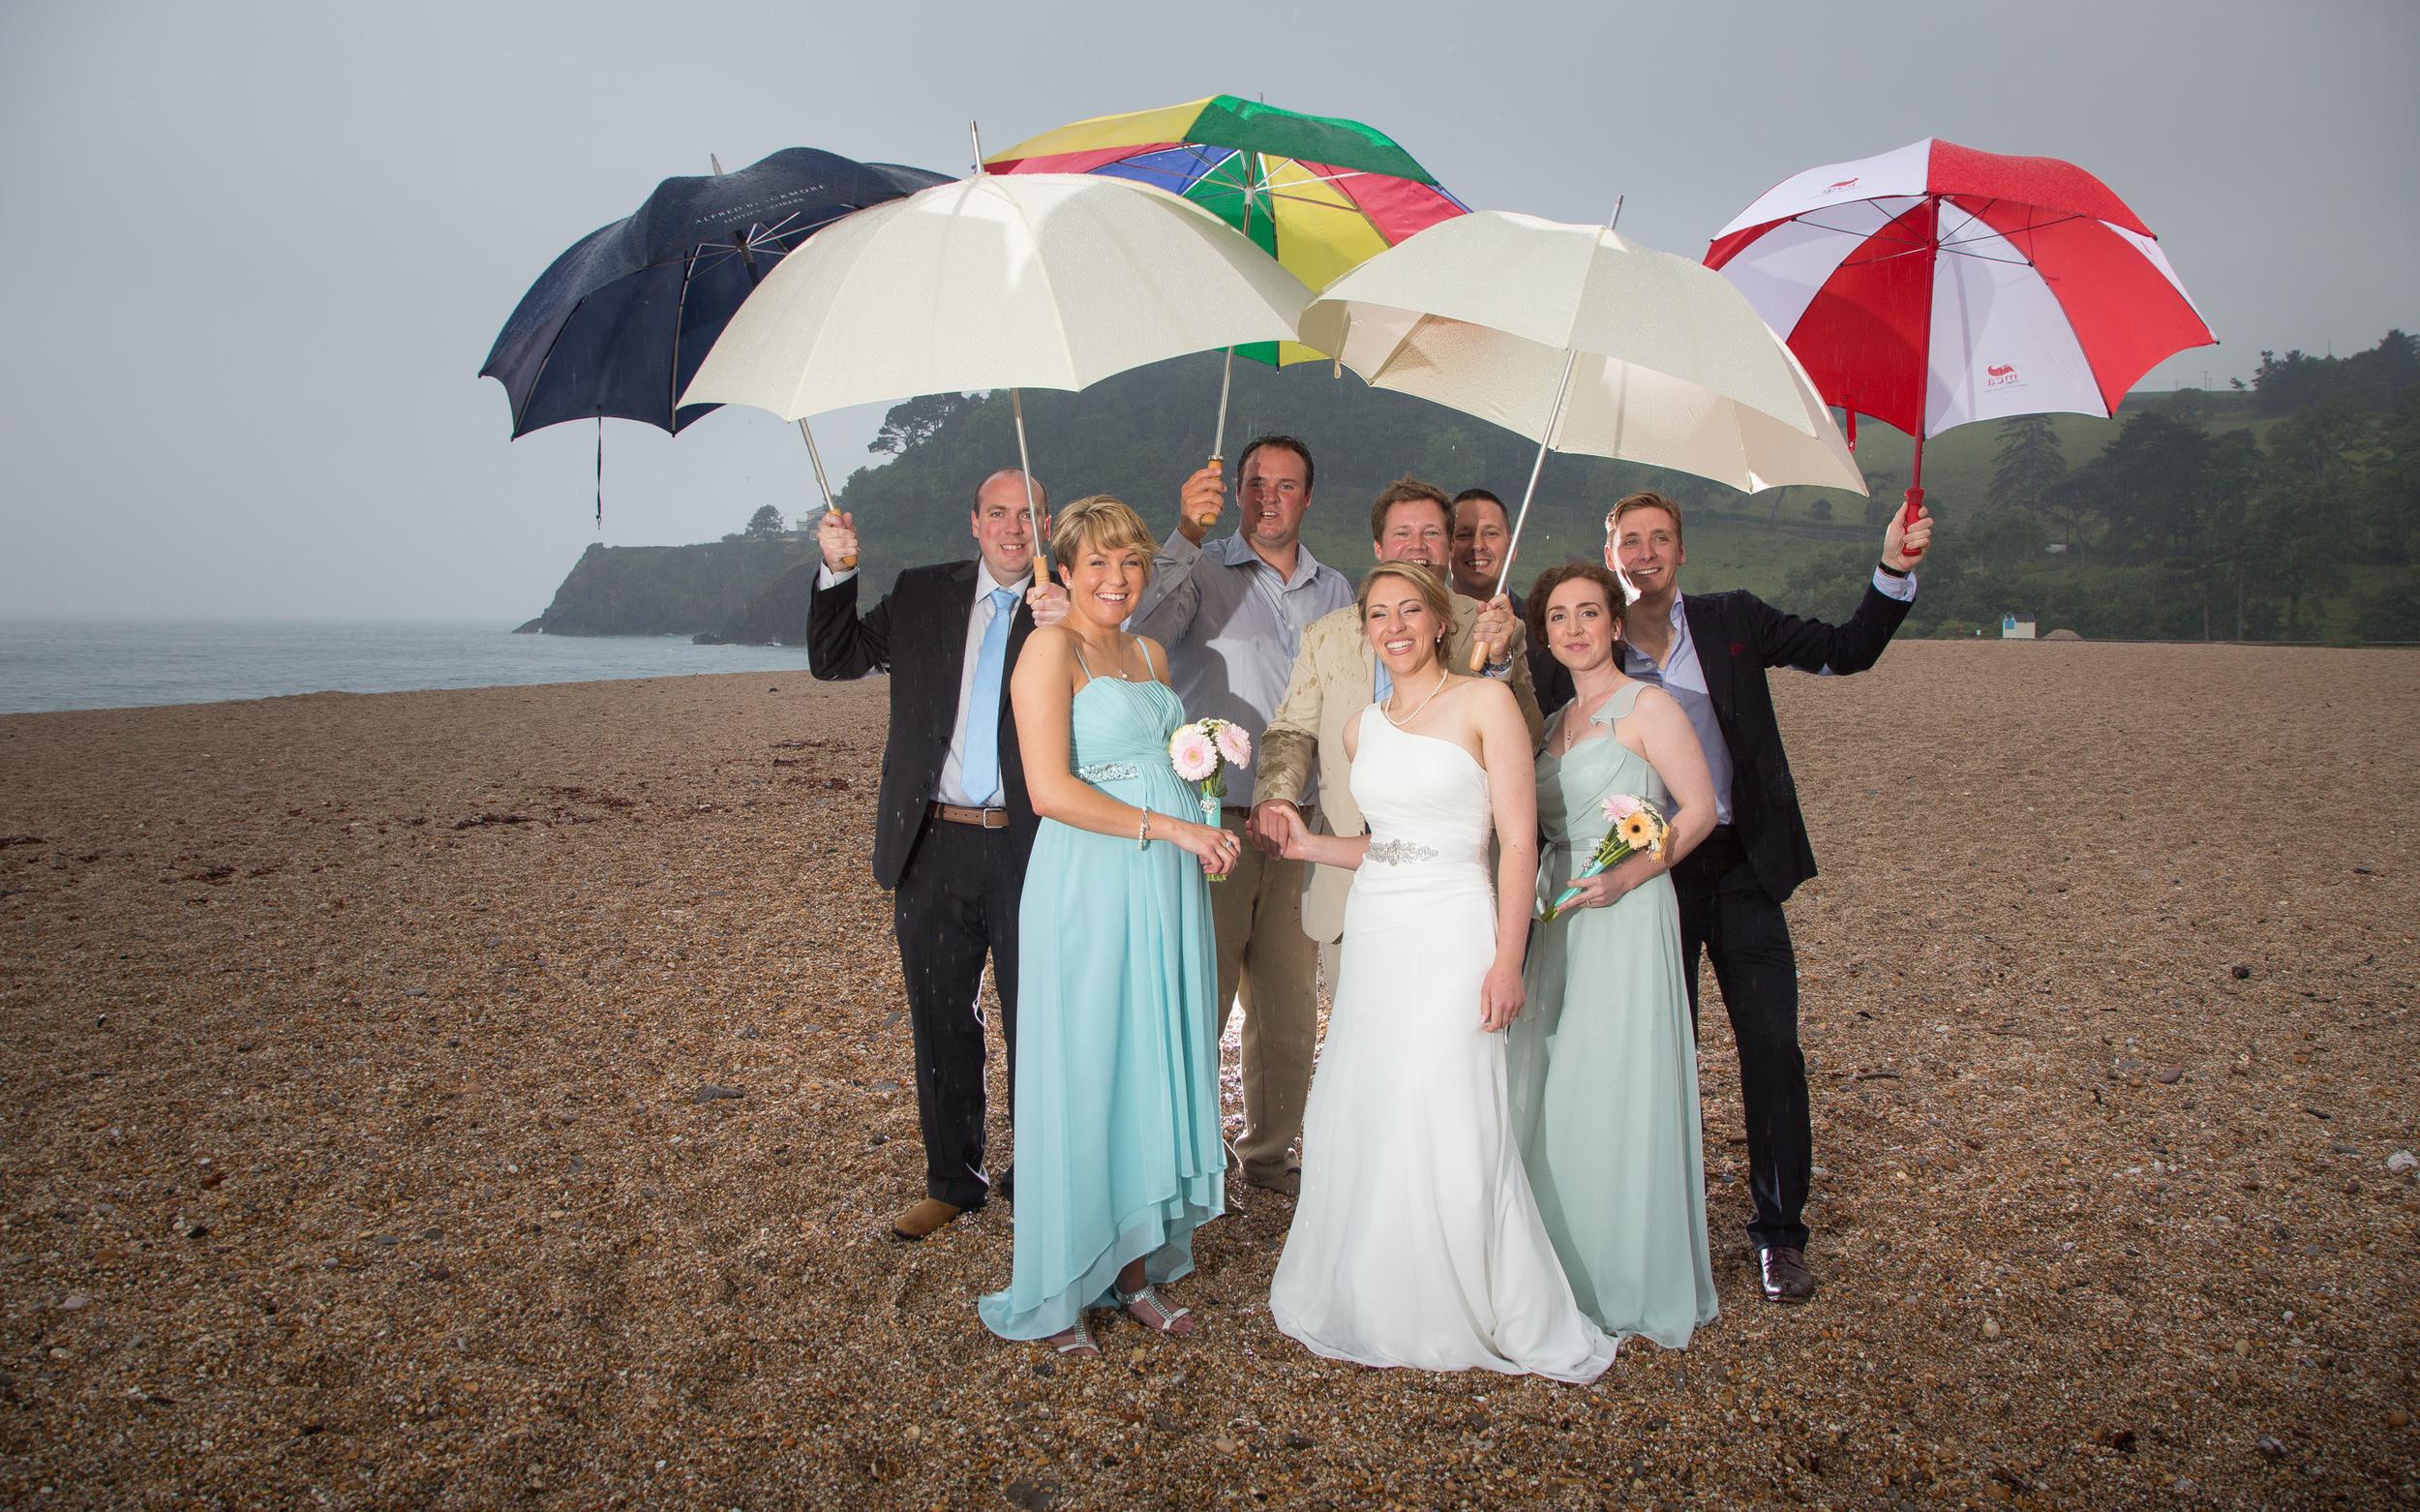 dartmouth-group-shot-london-uk-destination-wedding-photography-Adam-Rowley